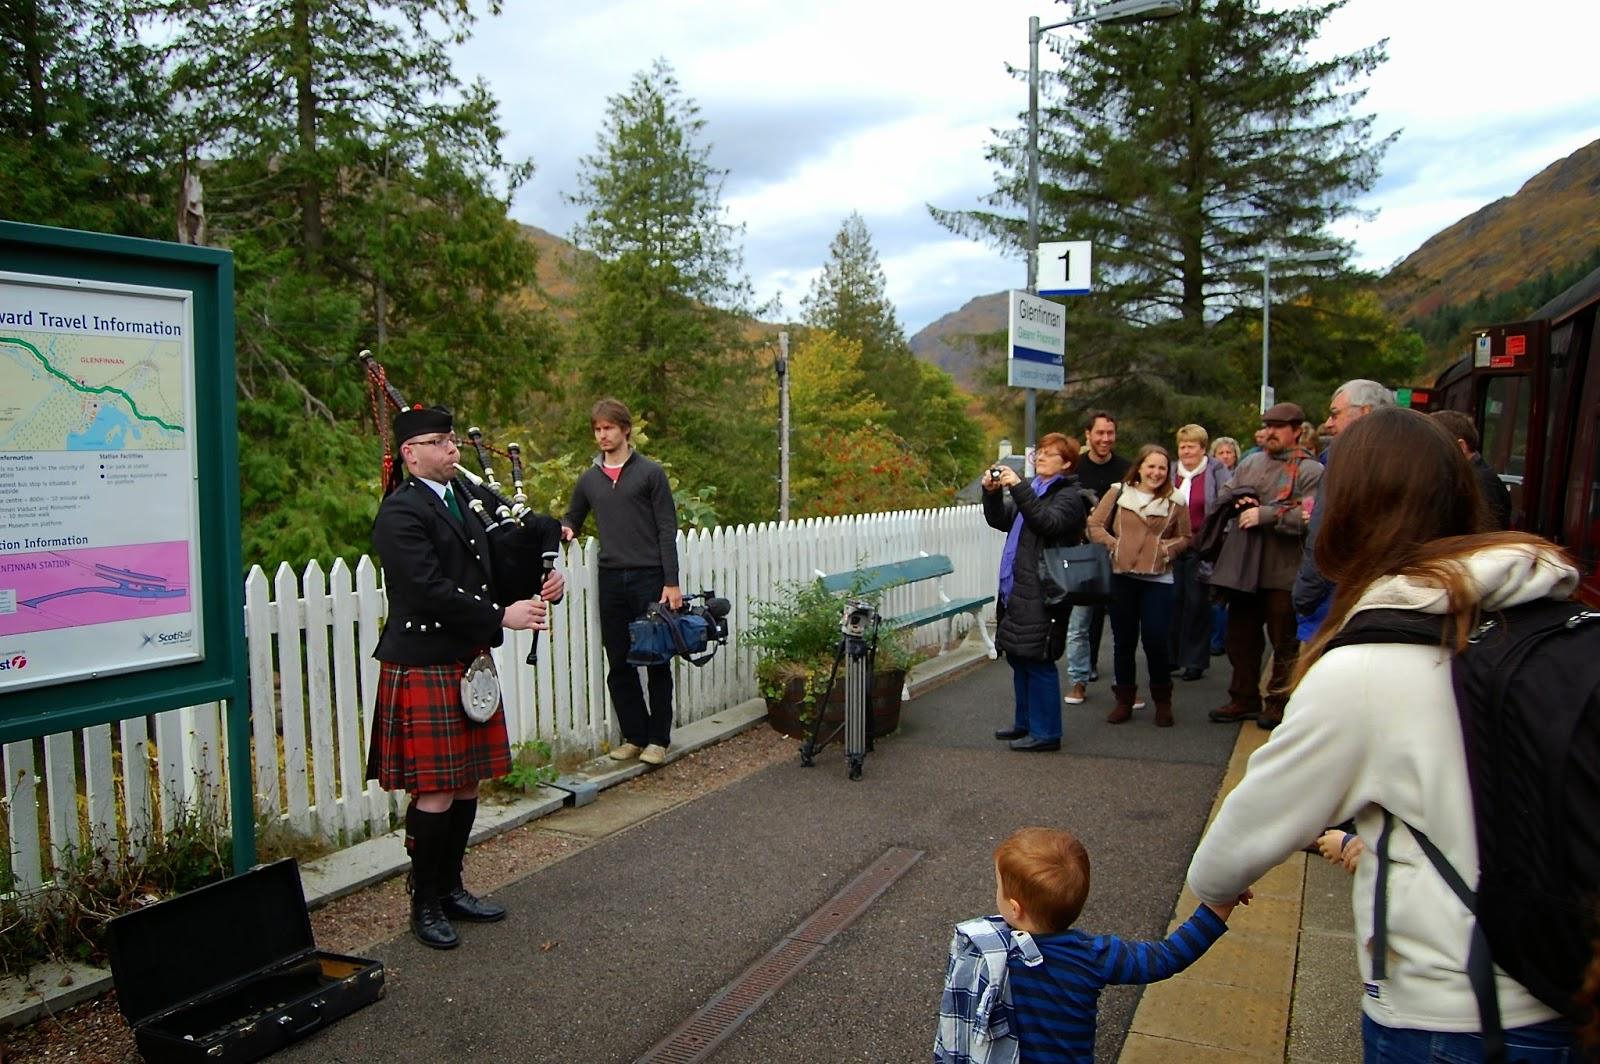 Bagpiper at the Glenfinnan train station